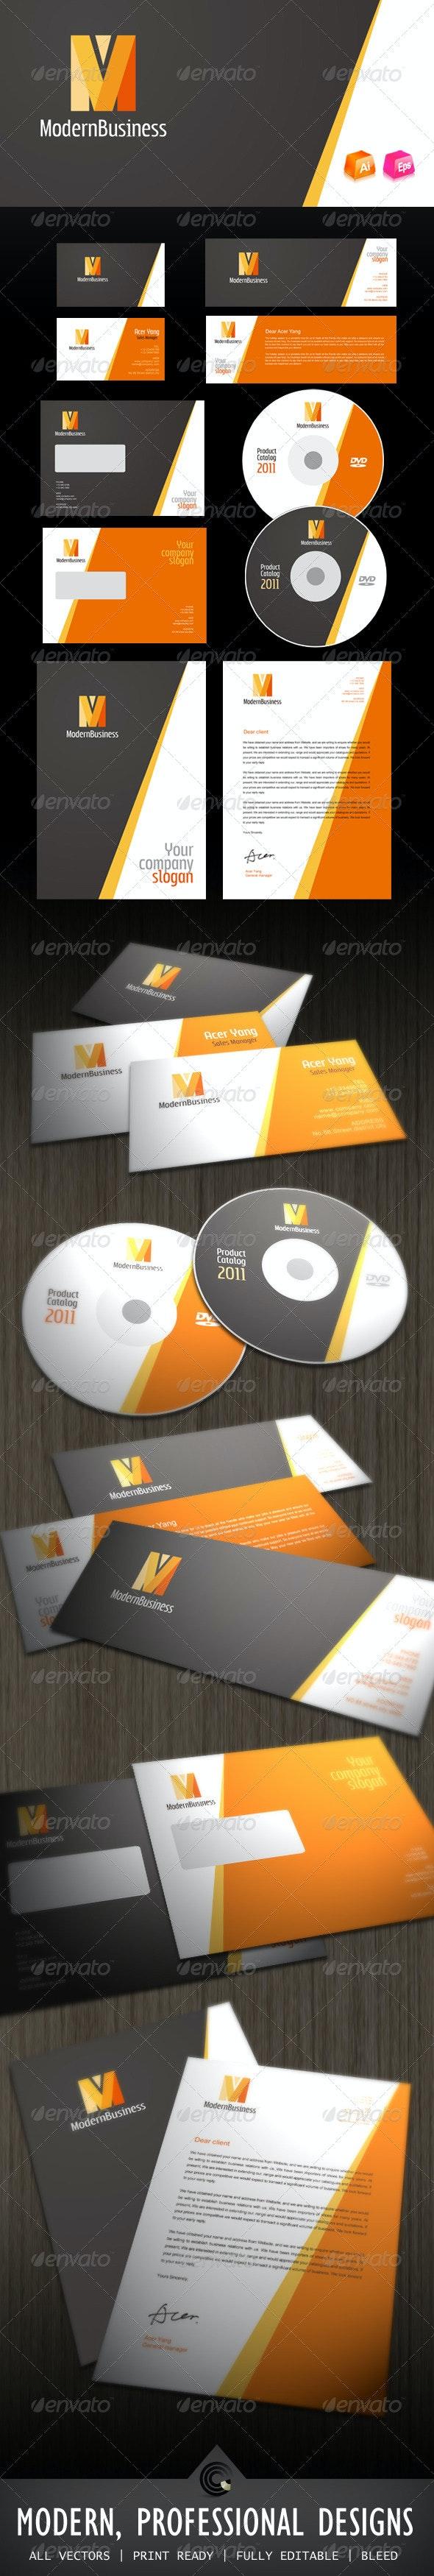 Modern Business Corporate Identity - Stationery Print Templates